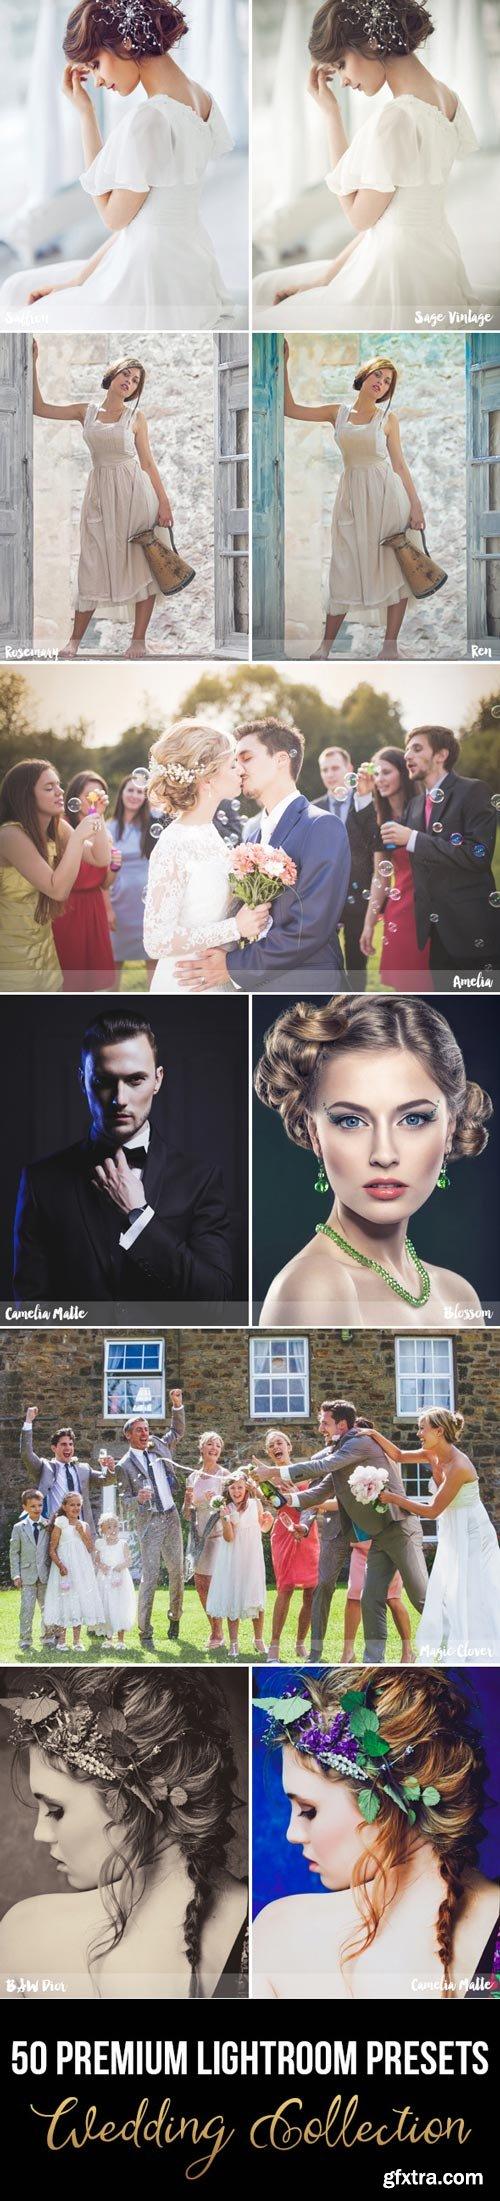 GR 50 Premium Wedding Lightroom Presets - 11494445